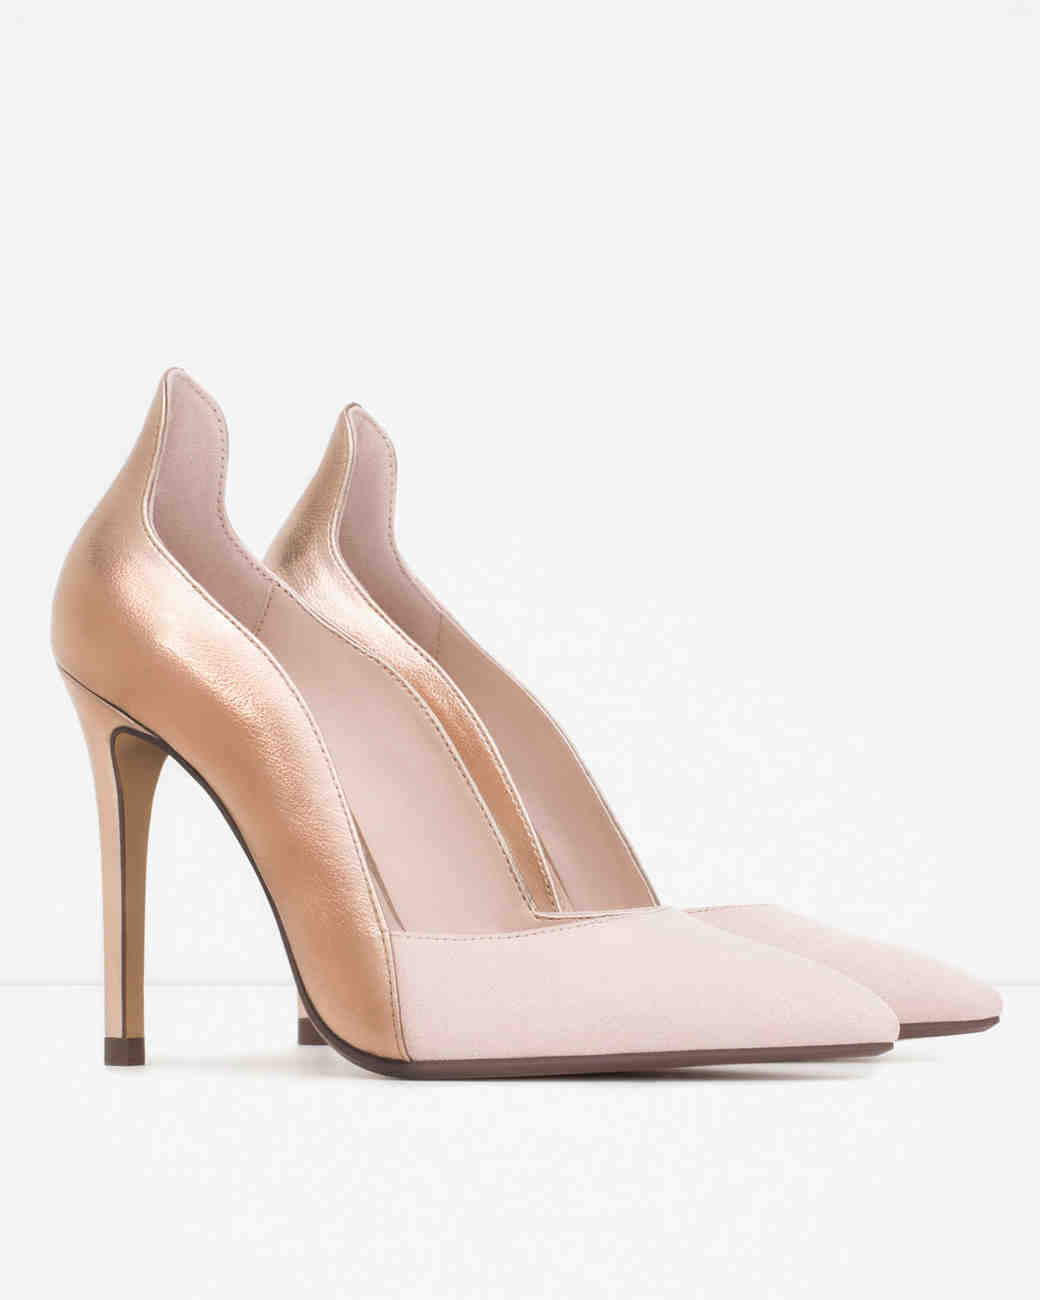 closed-toe-wedding-shoes-combined-zara-1215.jpg